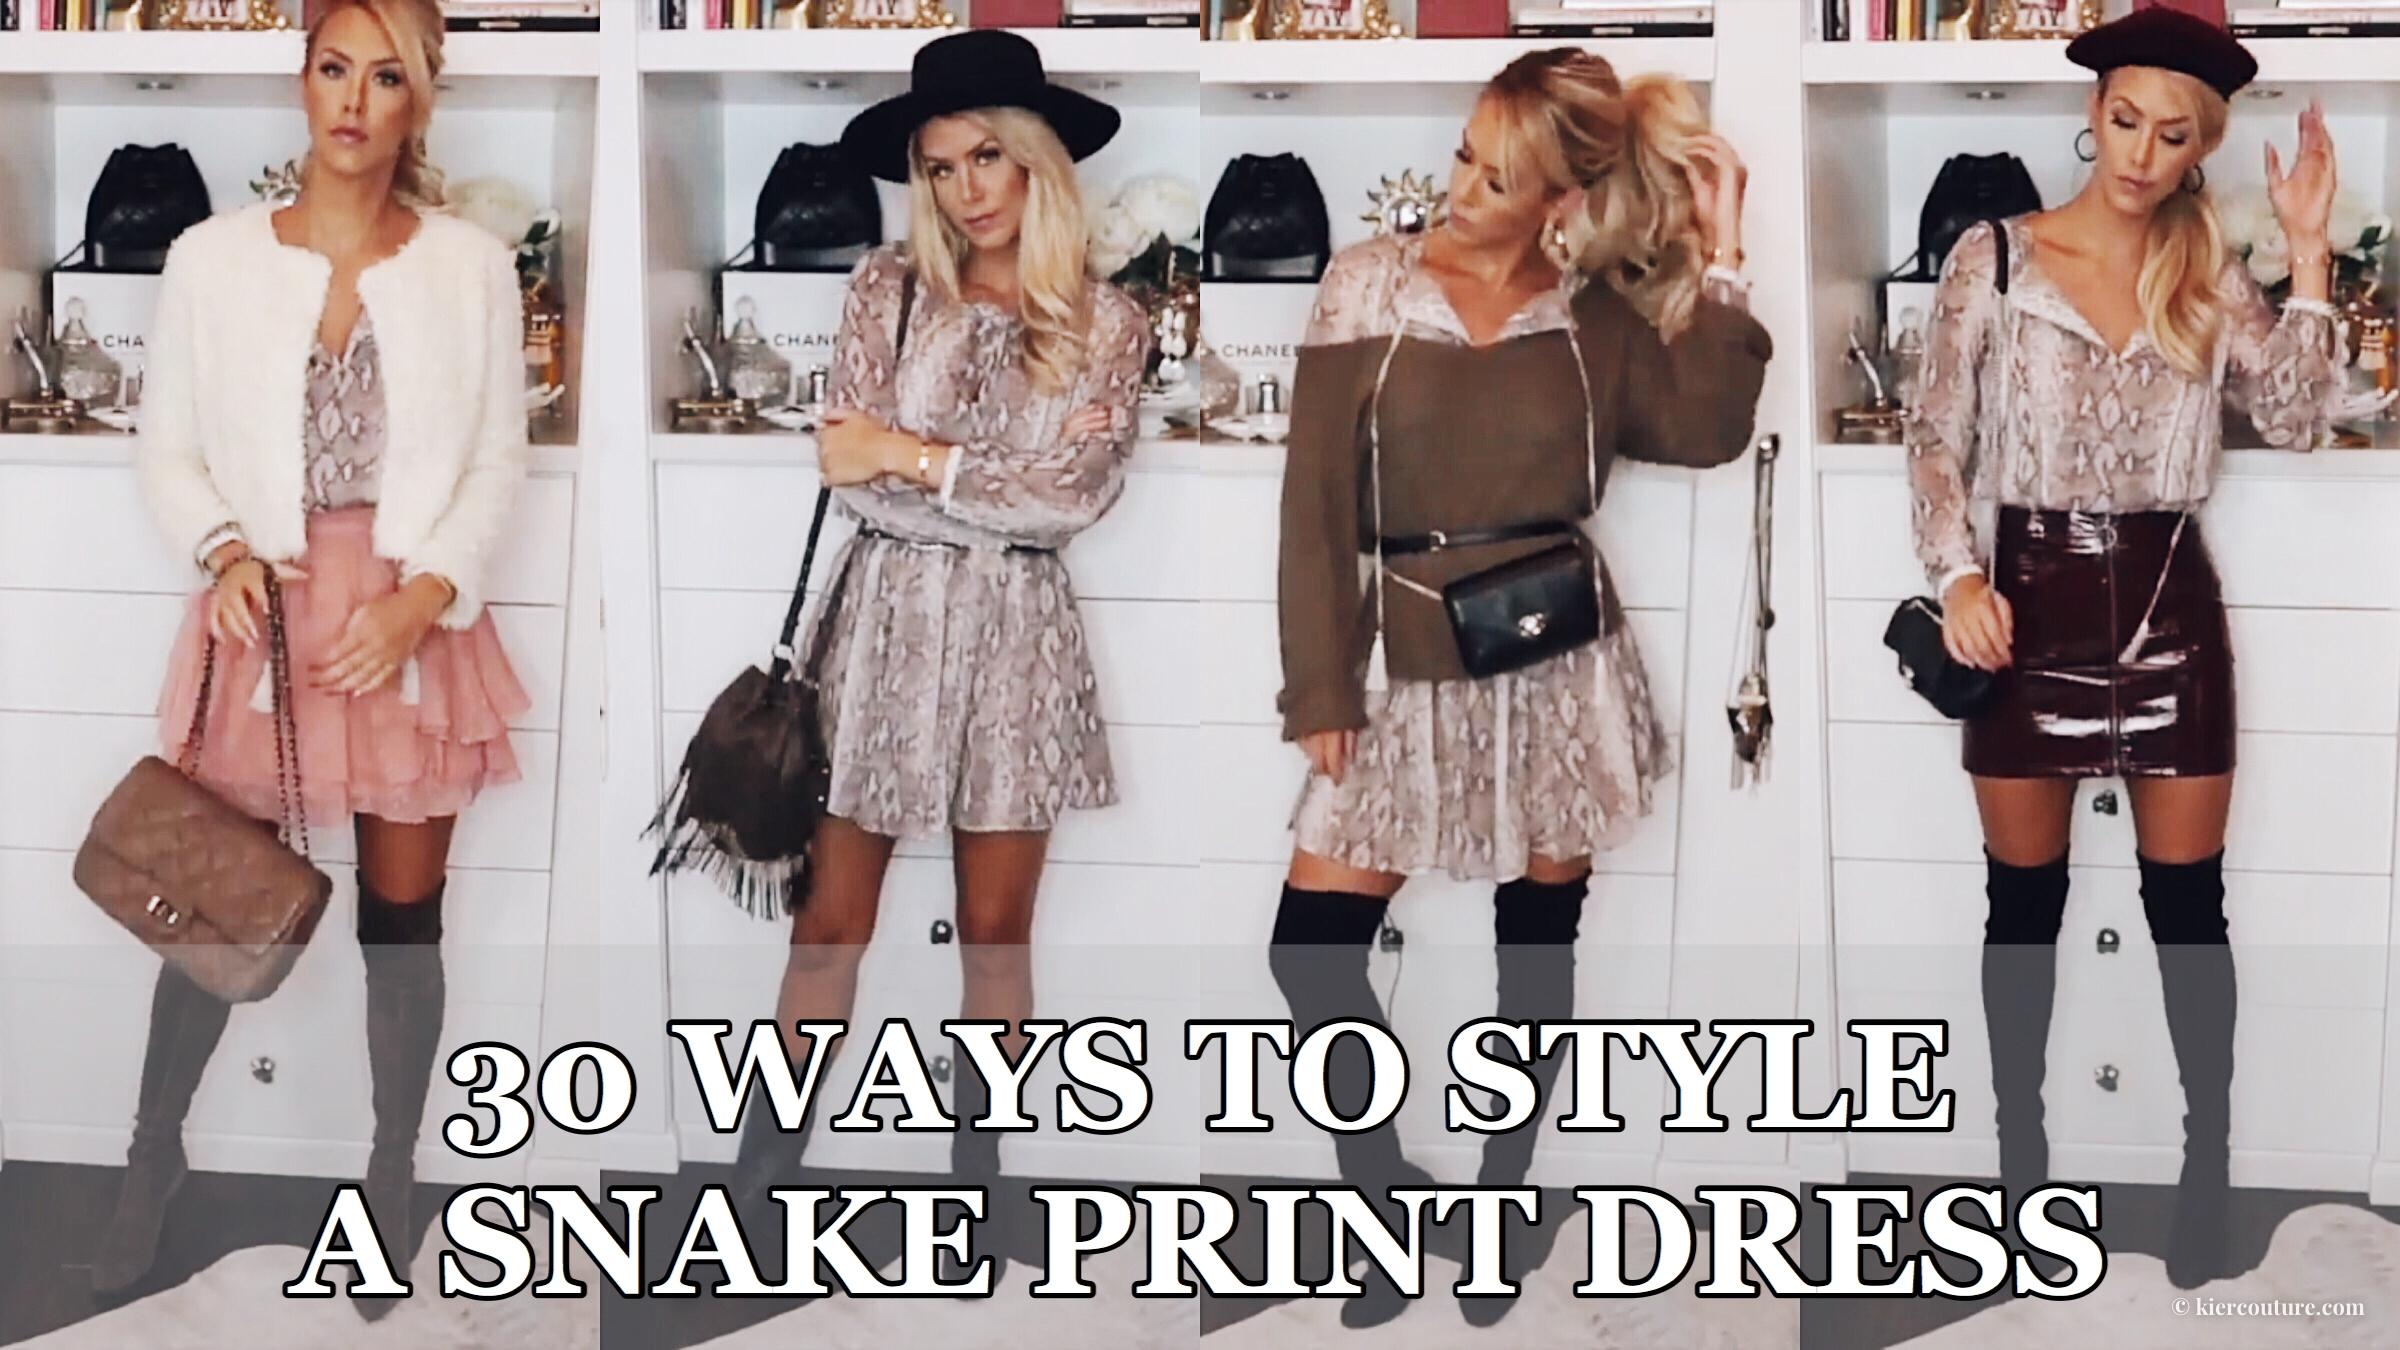 30 wears challenge: How to wear snake print